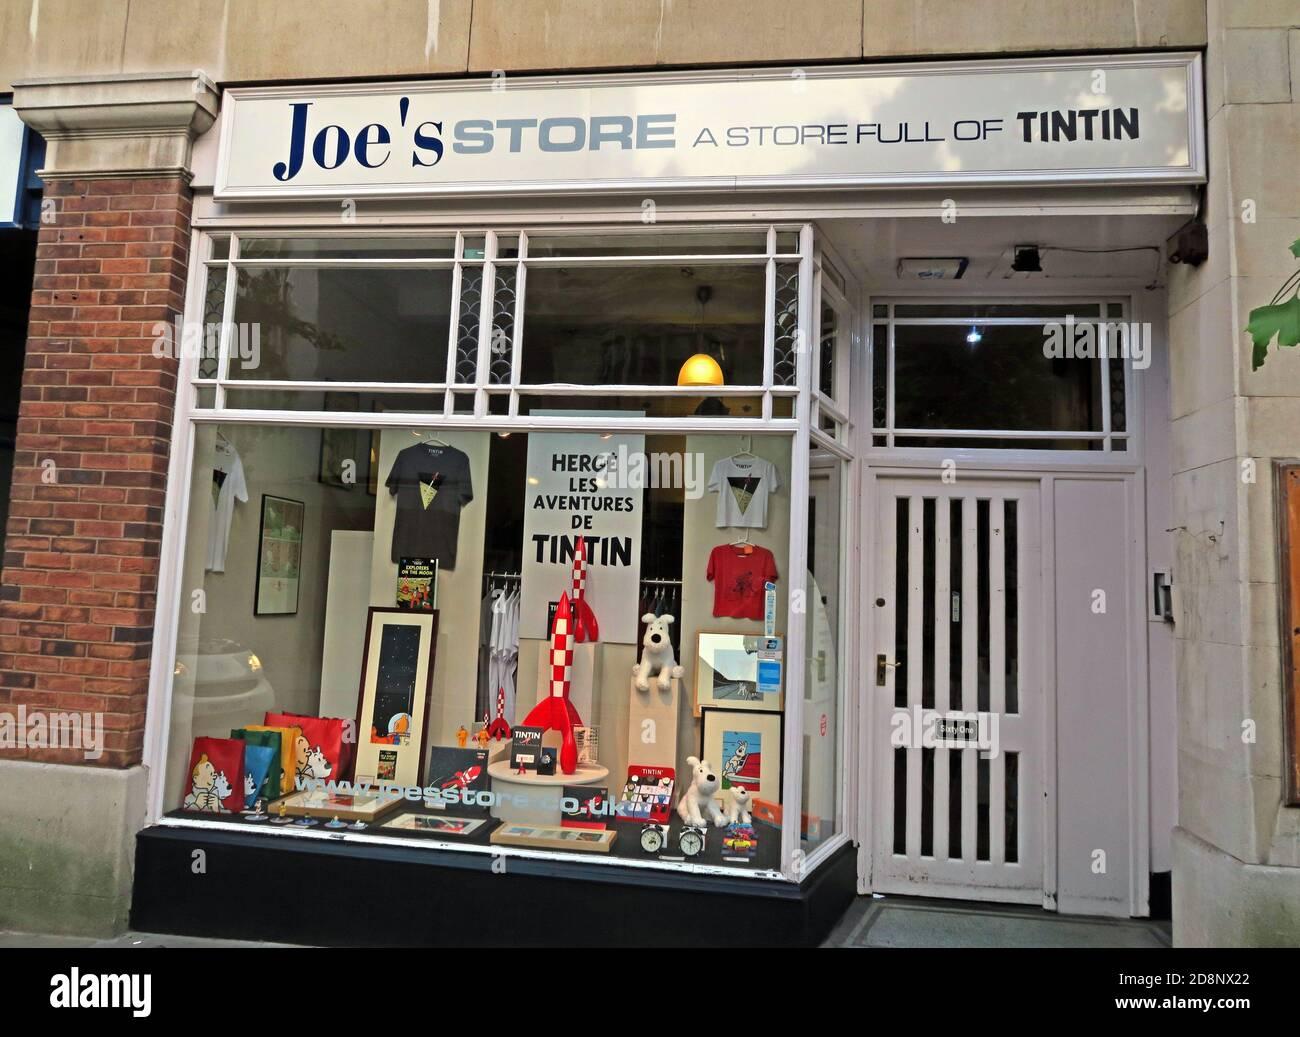 HotpixUK,@HotpixUK,GoTonySmith,UK,England,Great Britain,GB,city centre,Nottingham city centre,Notts,Nottinghamshire,NG1,Tin Tin,61 Friar Lane,Joes,store,shop,retail,Belgian,cartoonist,English,character,Des adventures De TinTin,Snowy,comic,comics